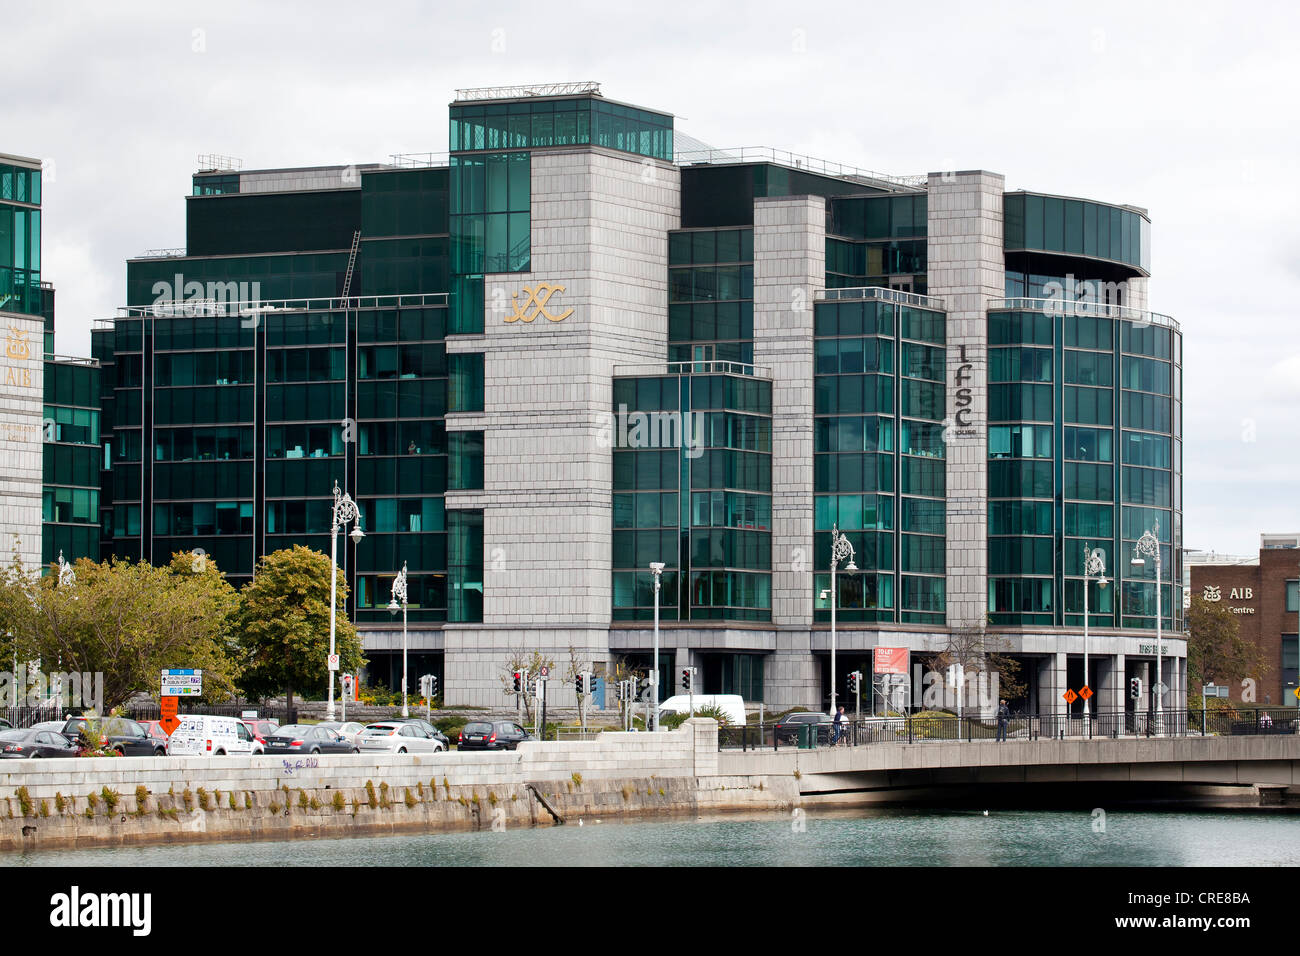 Allied Irish Banks AIB, Dublin, Ireland